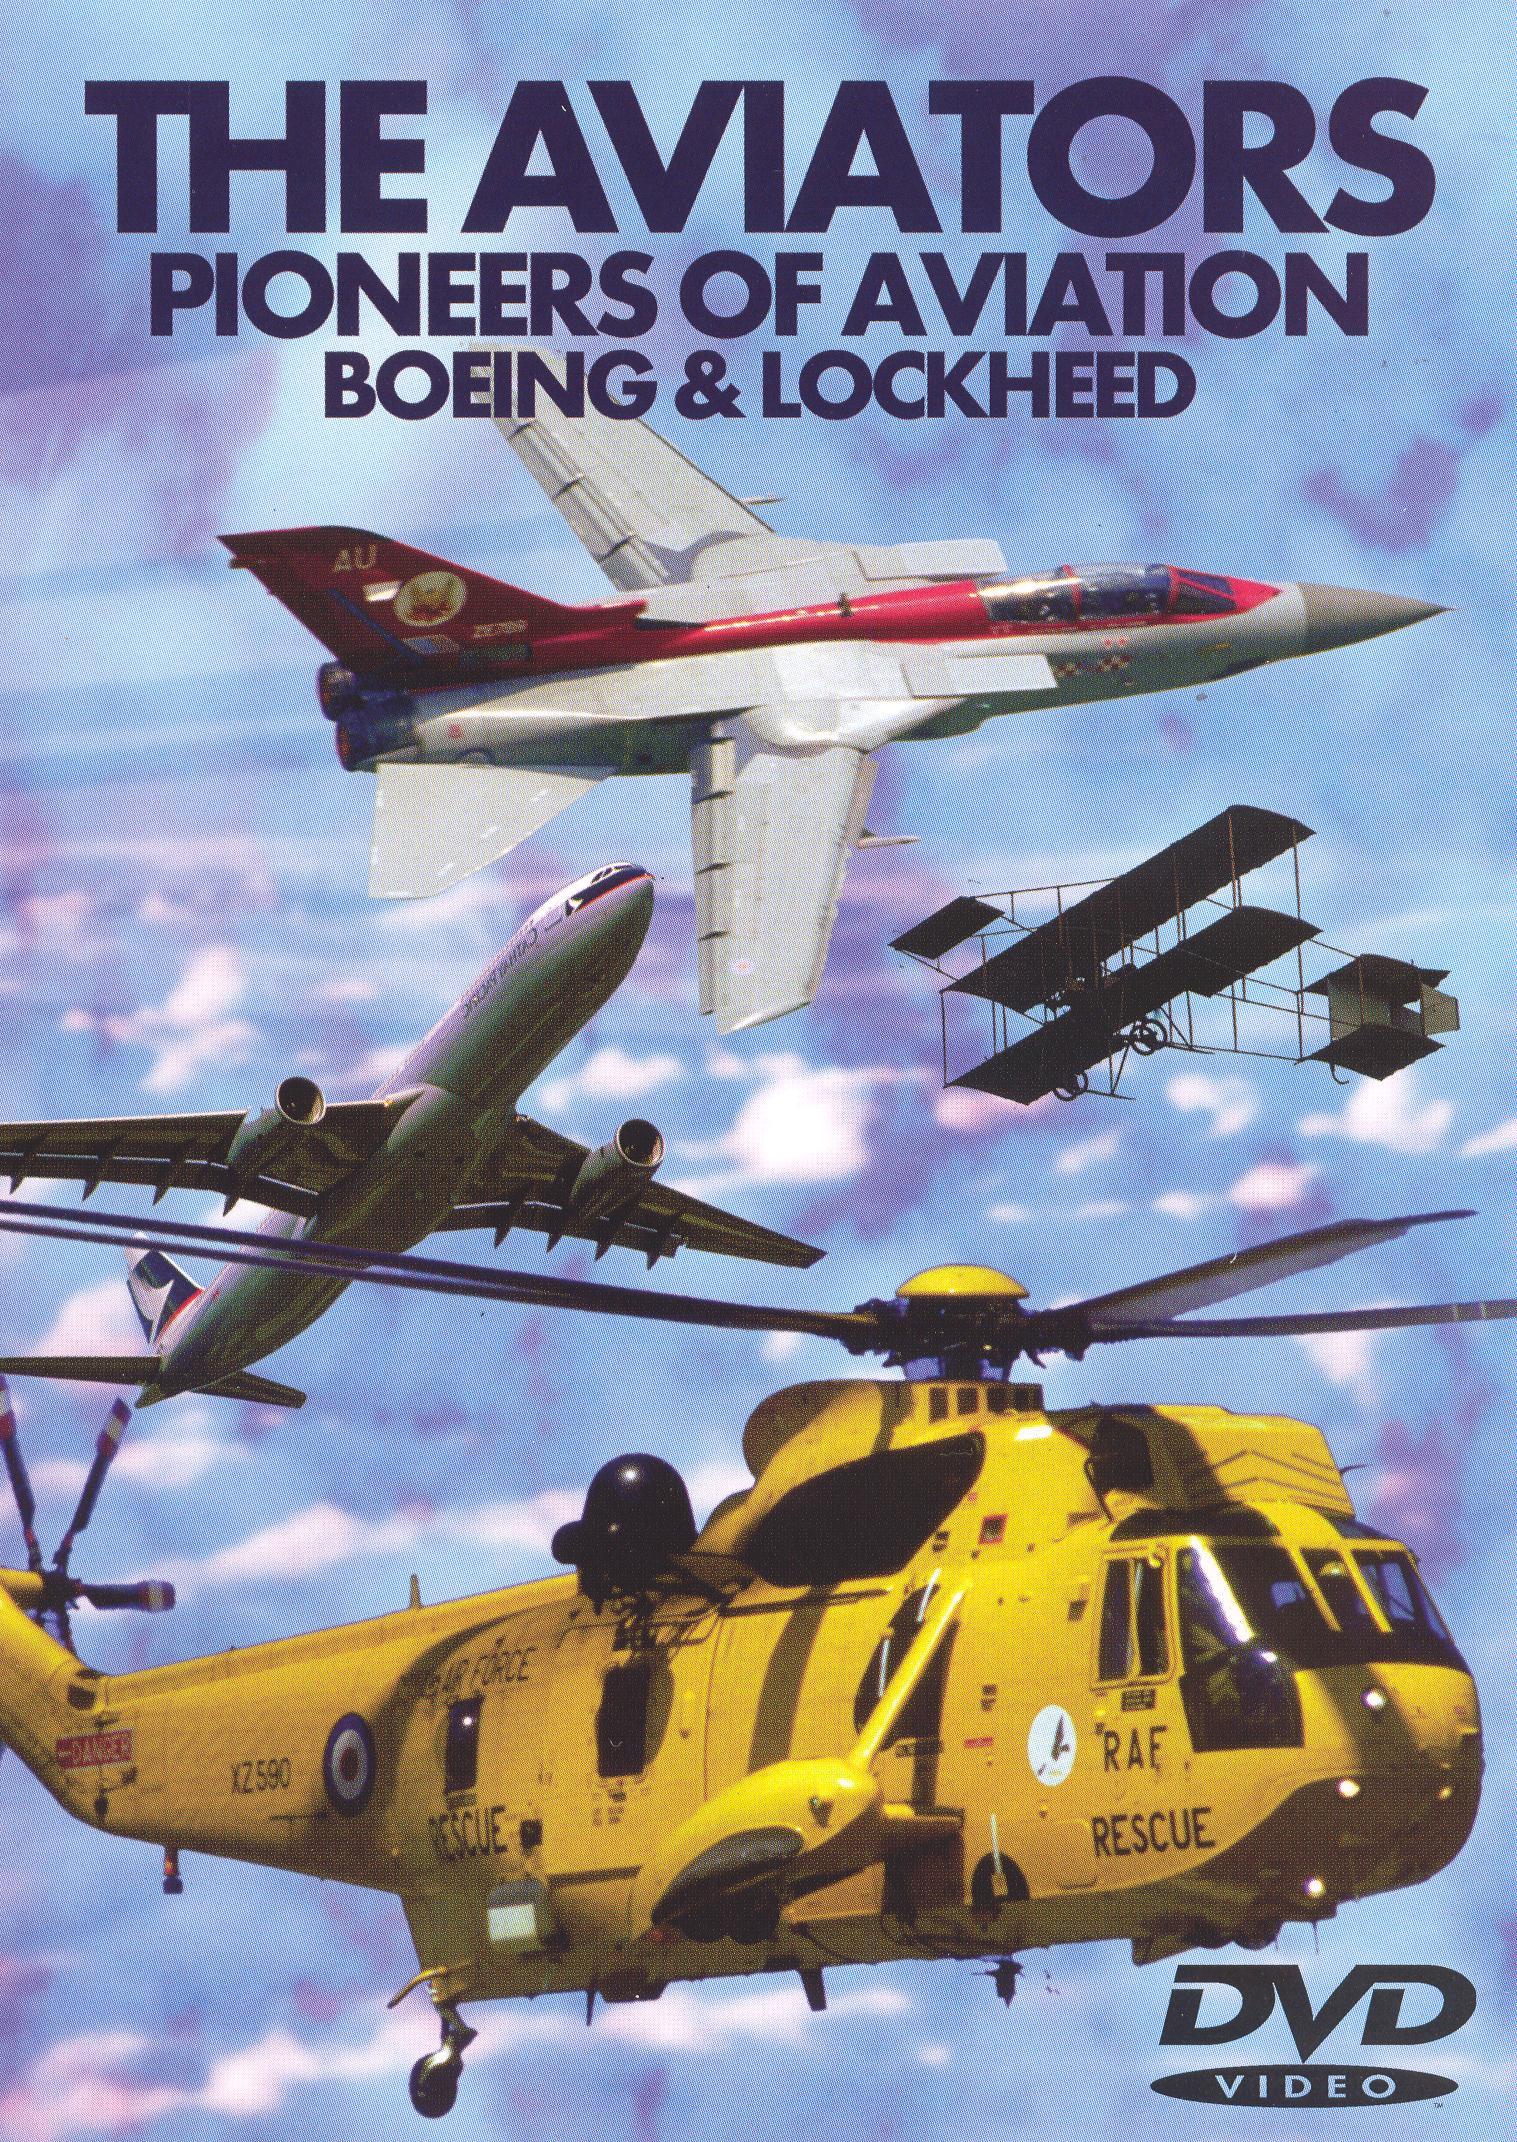 The Aviators - Pioneers of Aviation: Boeing and Lockheed